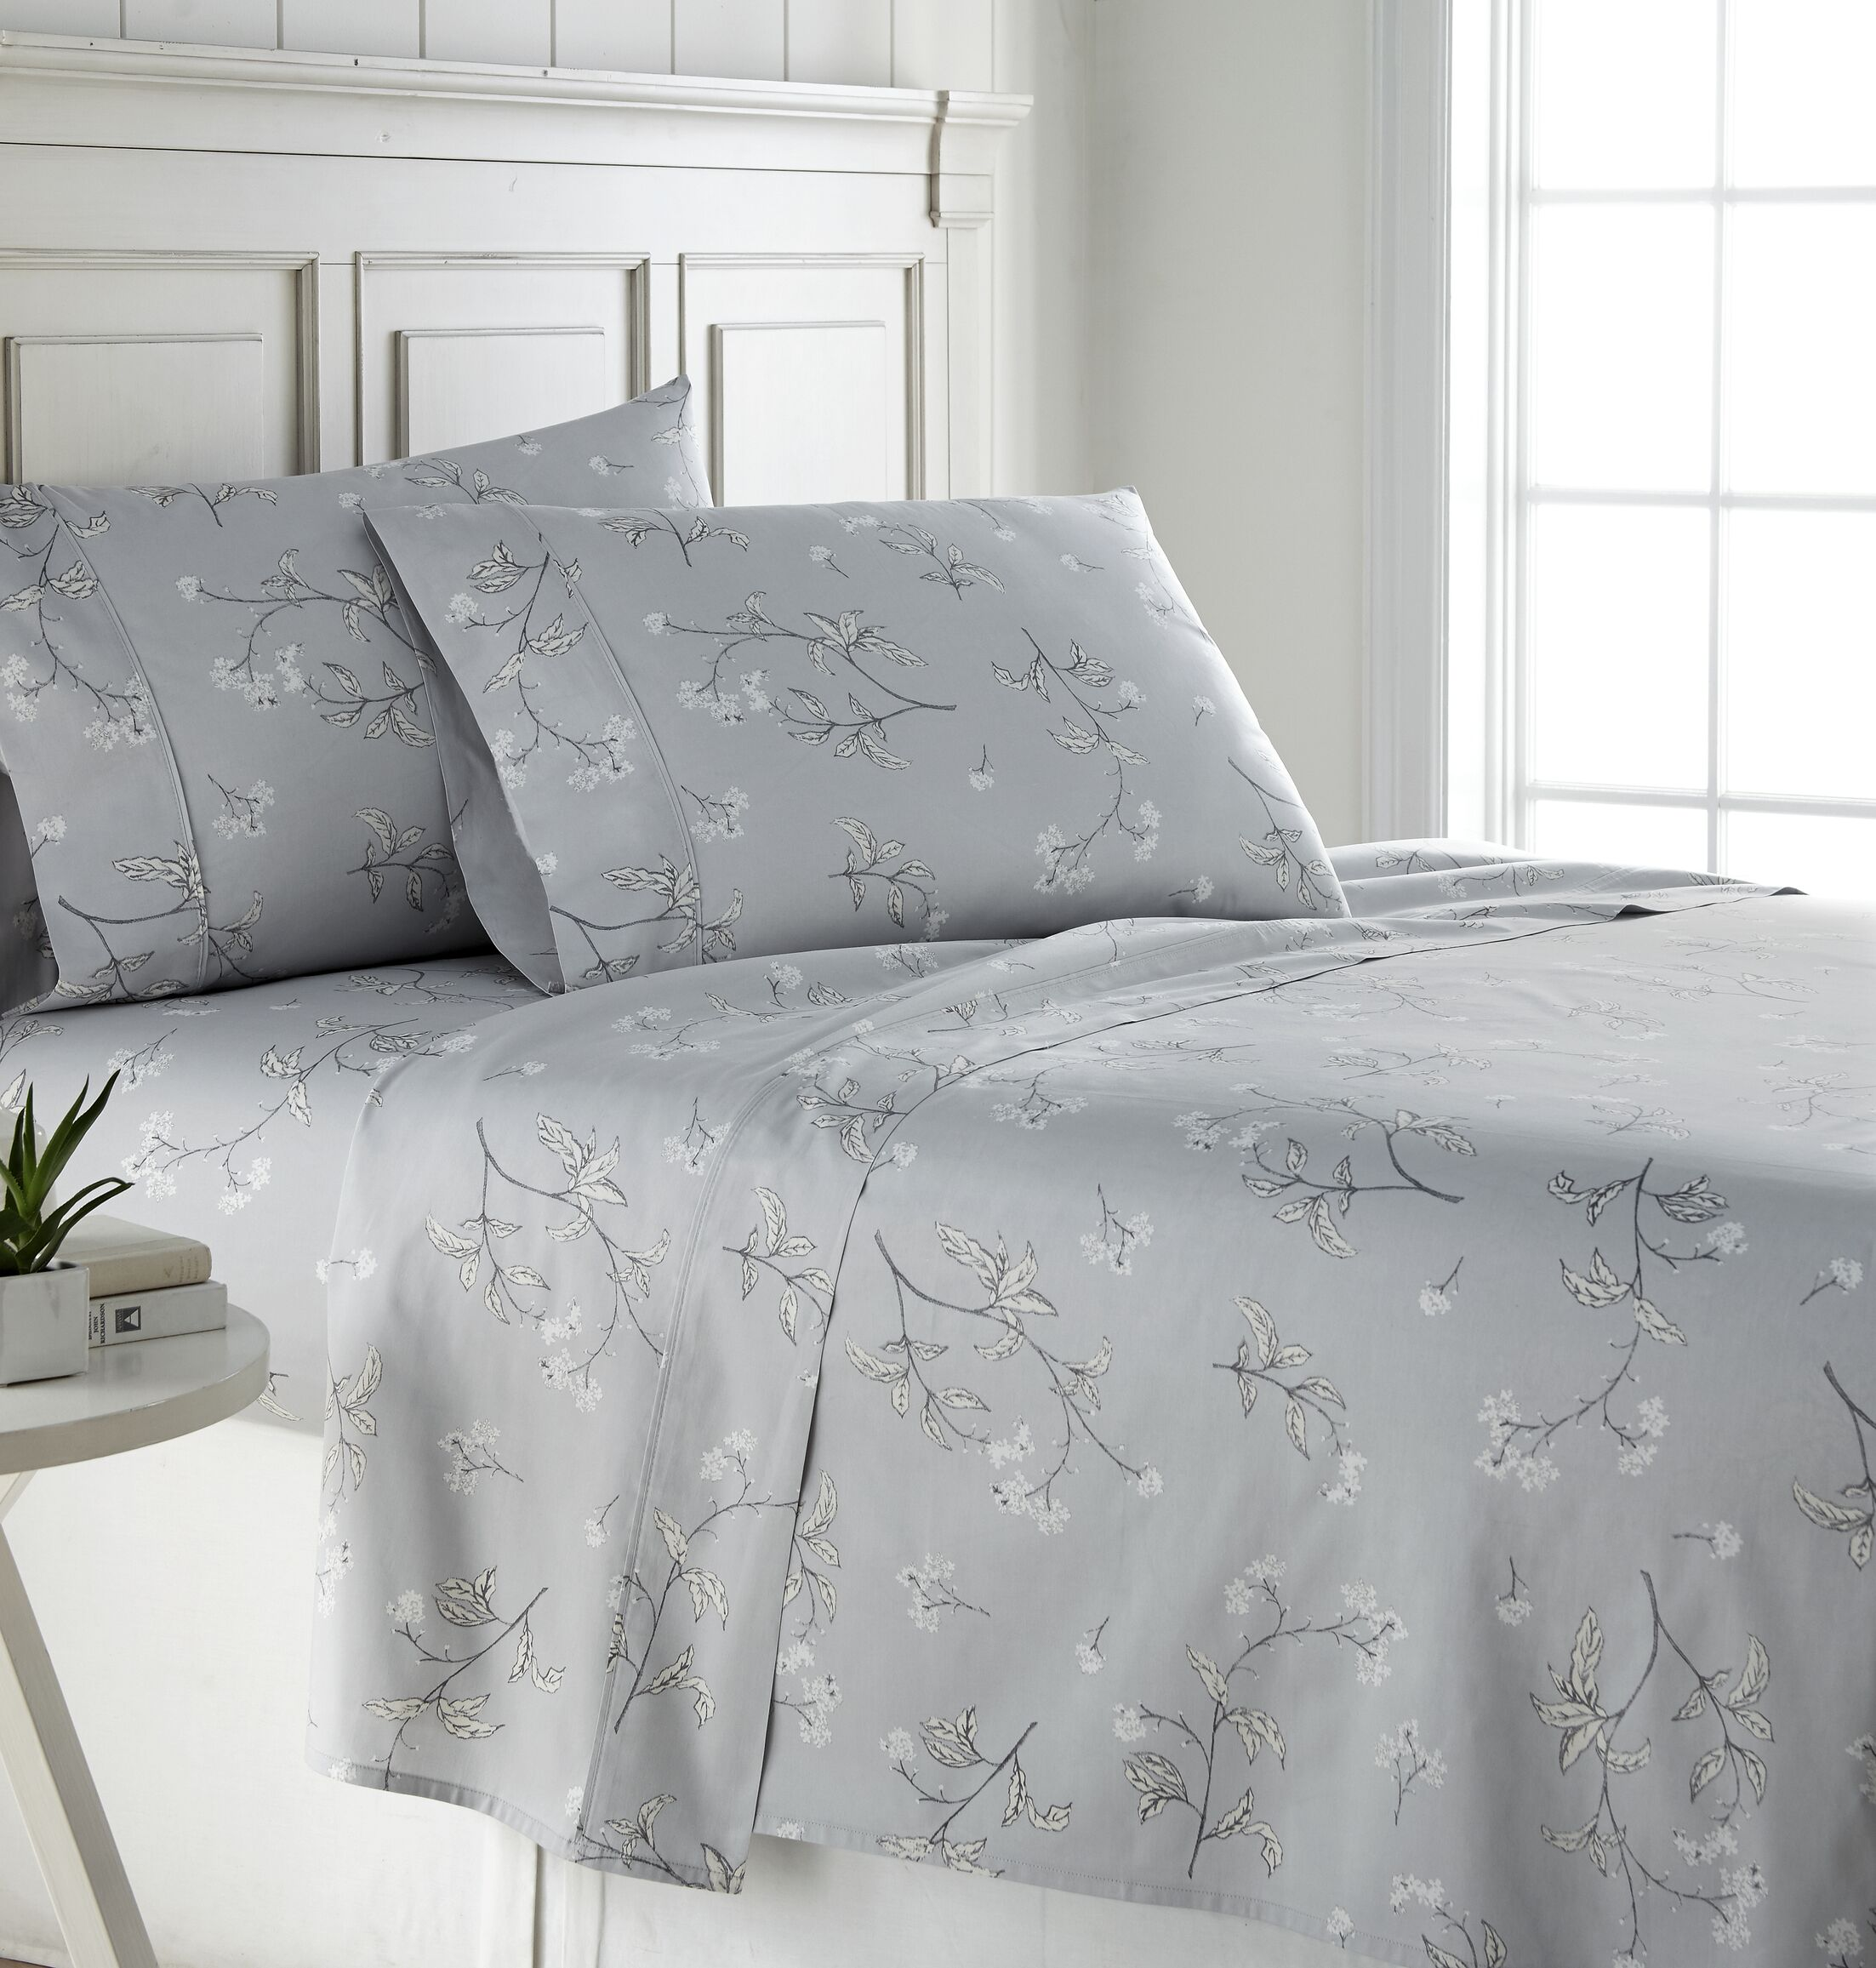 Tabor Extra Deep Pocket 300 Thread Count 100% Cotton Sheet Set Size: California King, Color: Gray